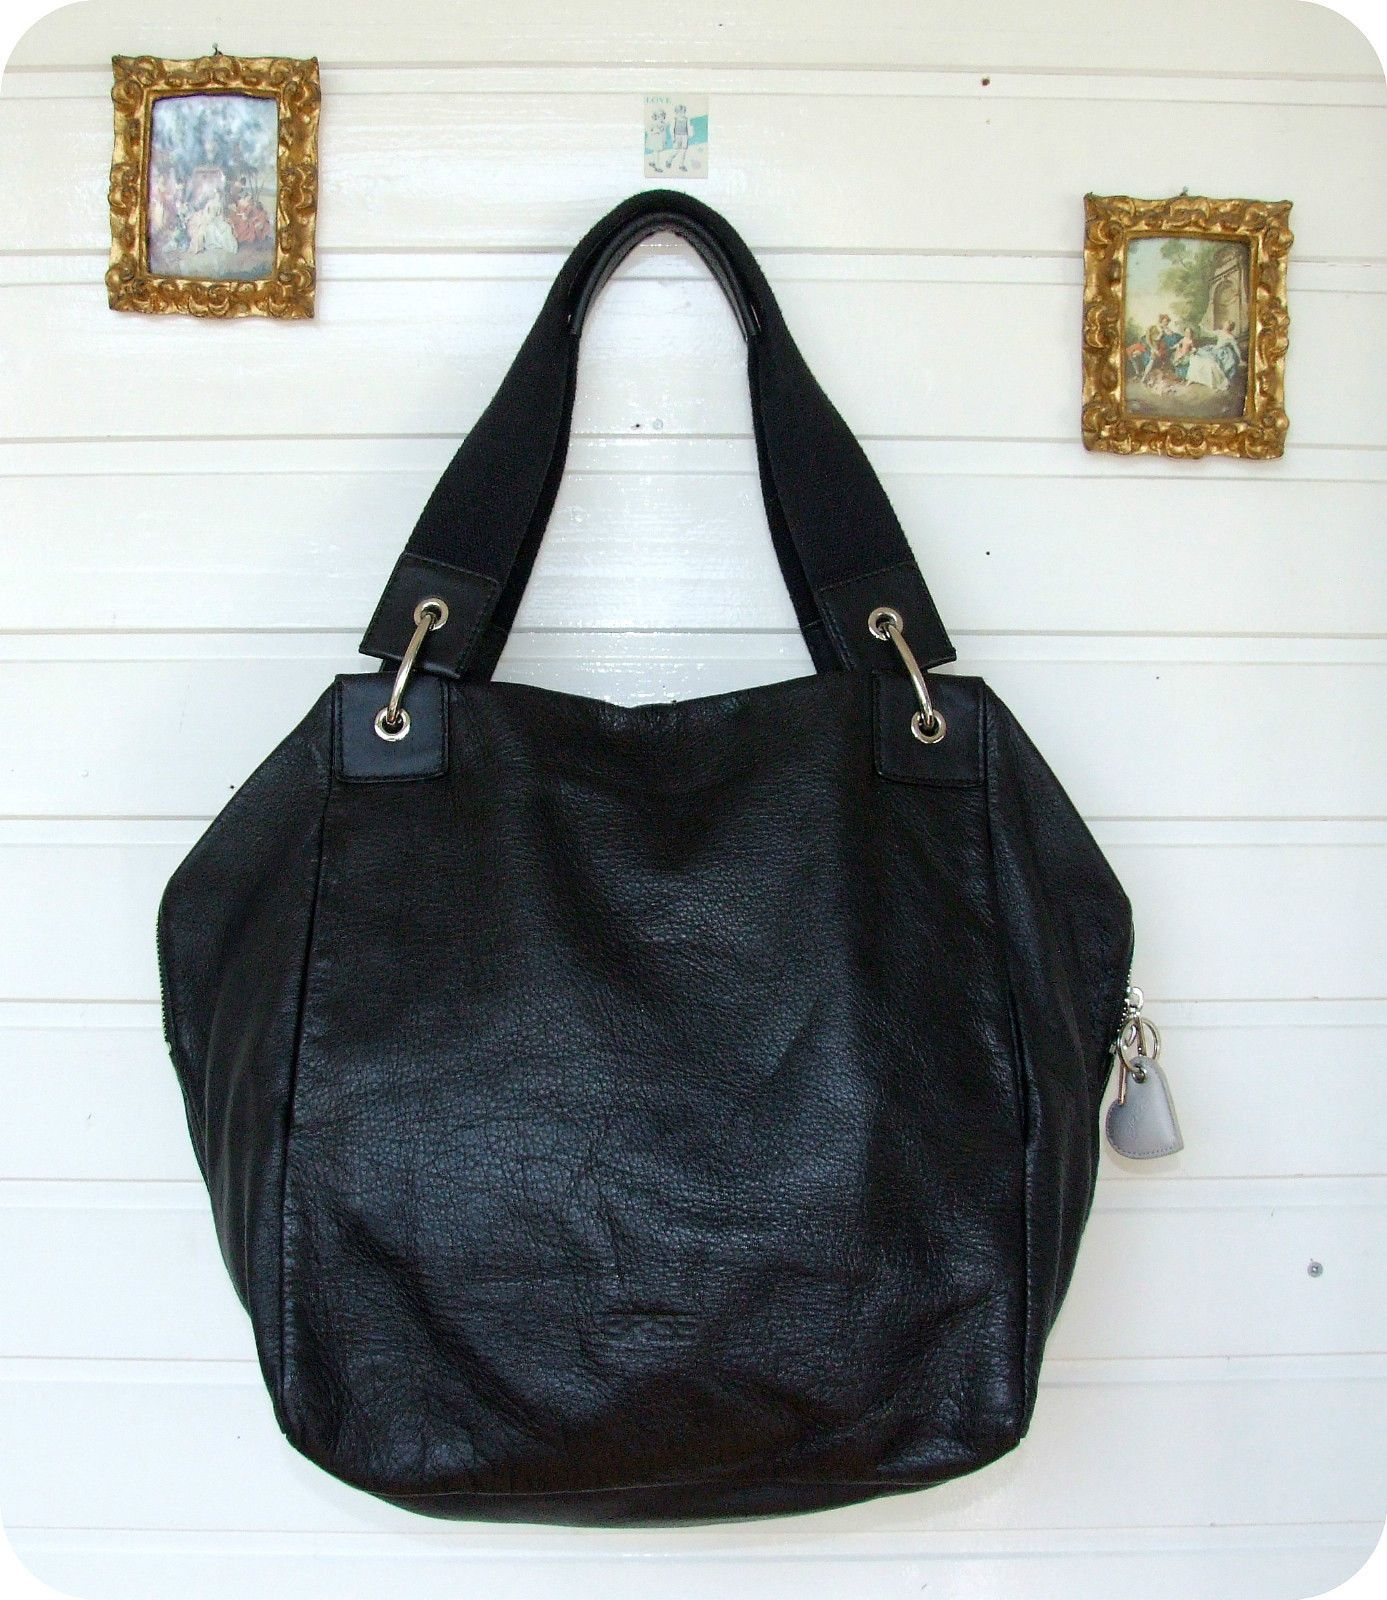 37f8e1df07454 BREE Leder Beutel Tasche Tote Bag Schultertasche Shopper XL SAC Leather  Purse in Kleidung   Accessoires